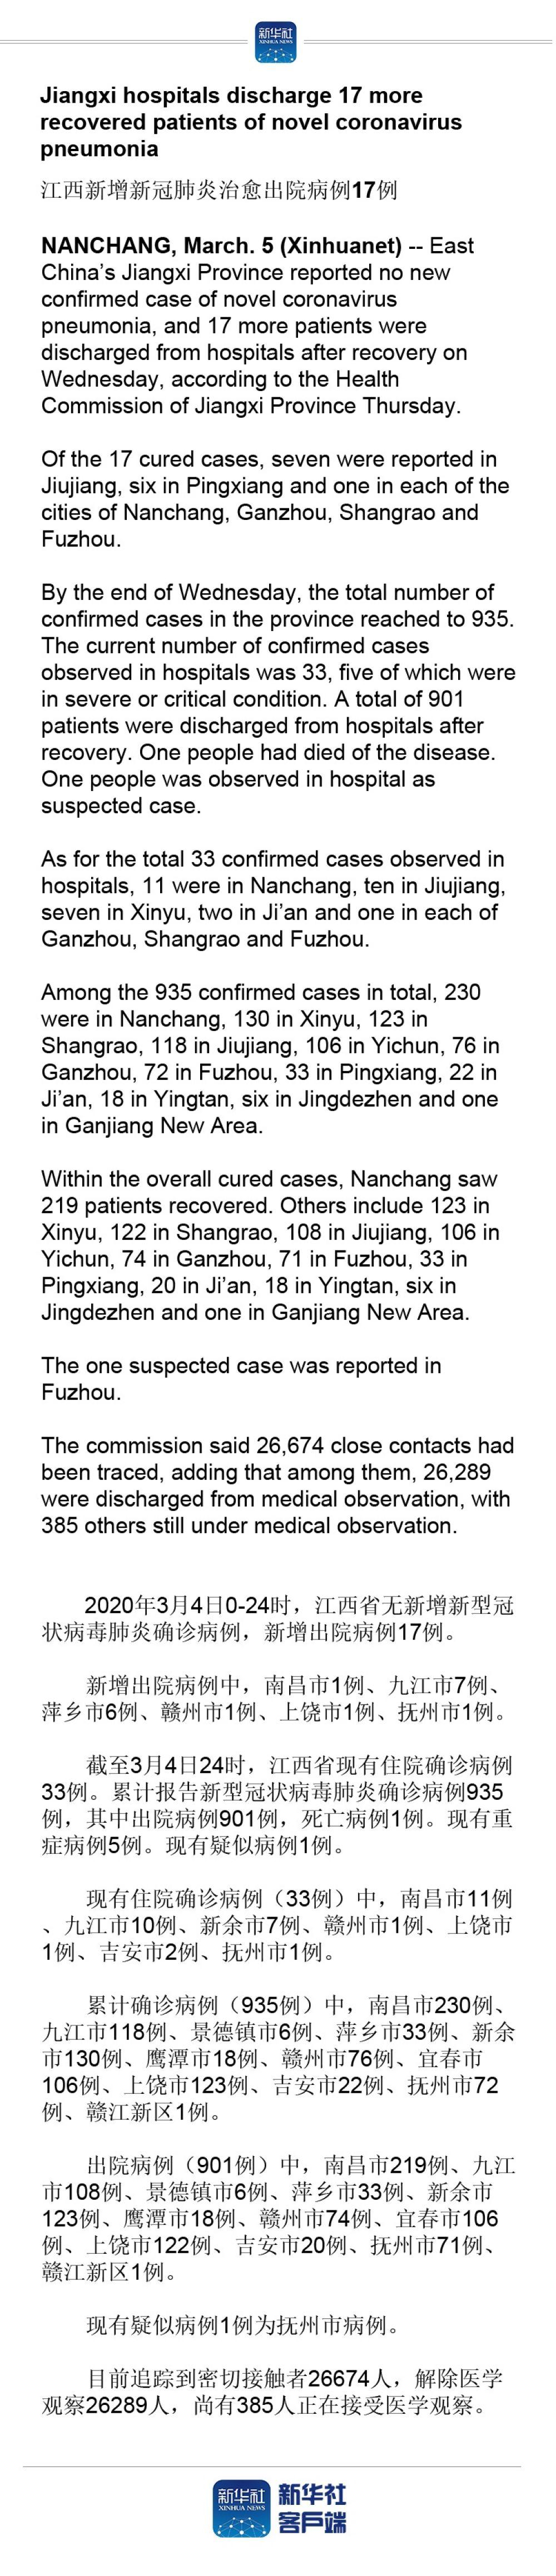 Jiangxi hospitals discharge 17 more recovered patients of novel coronavirus pneumonia